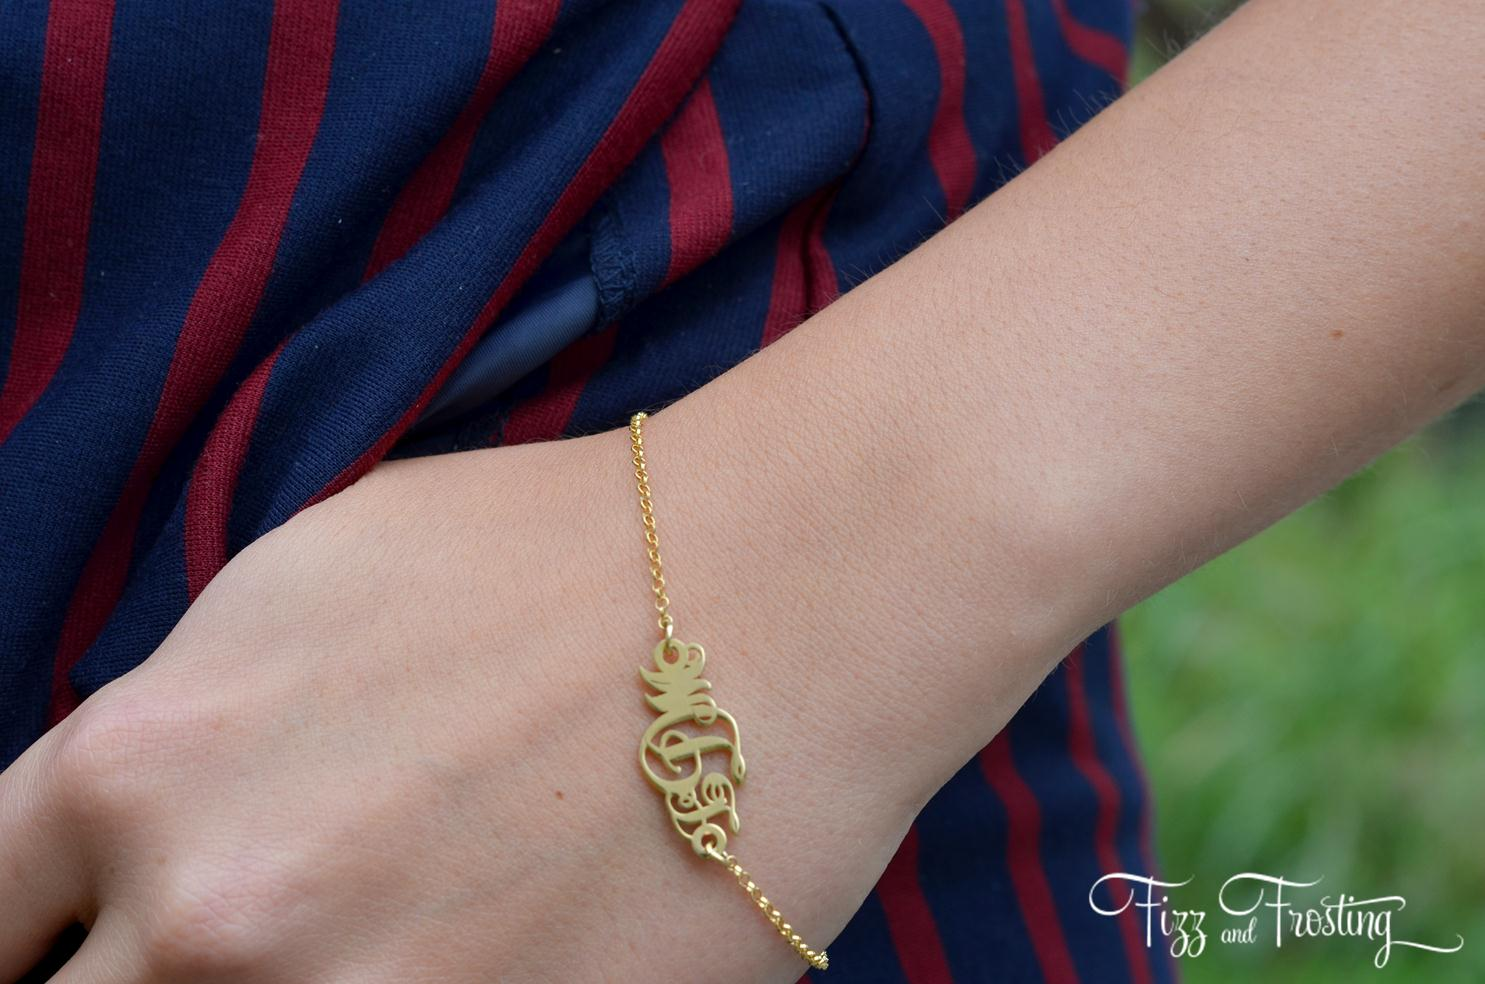 onecklace monogram bracelet